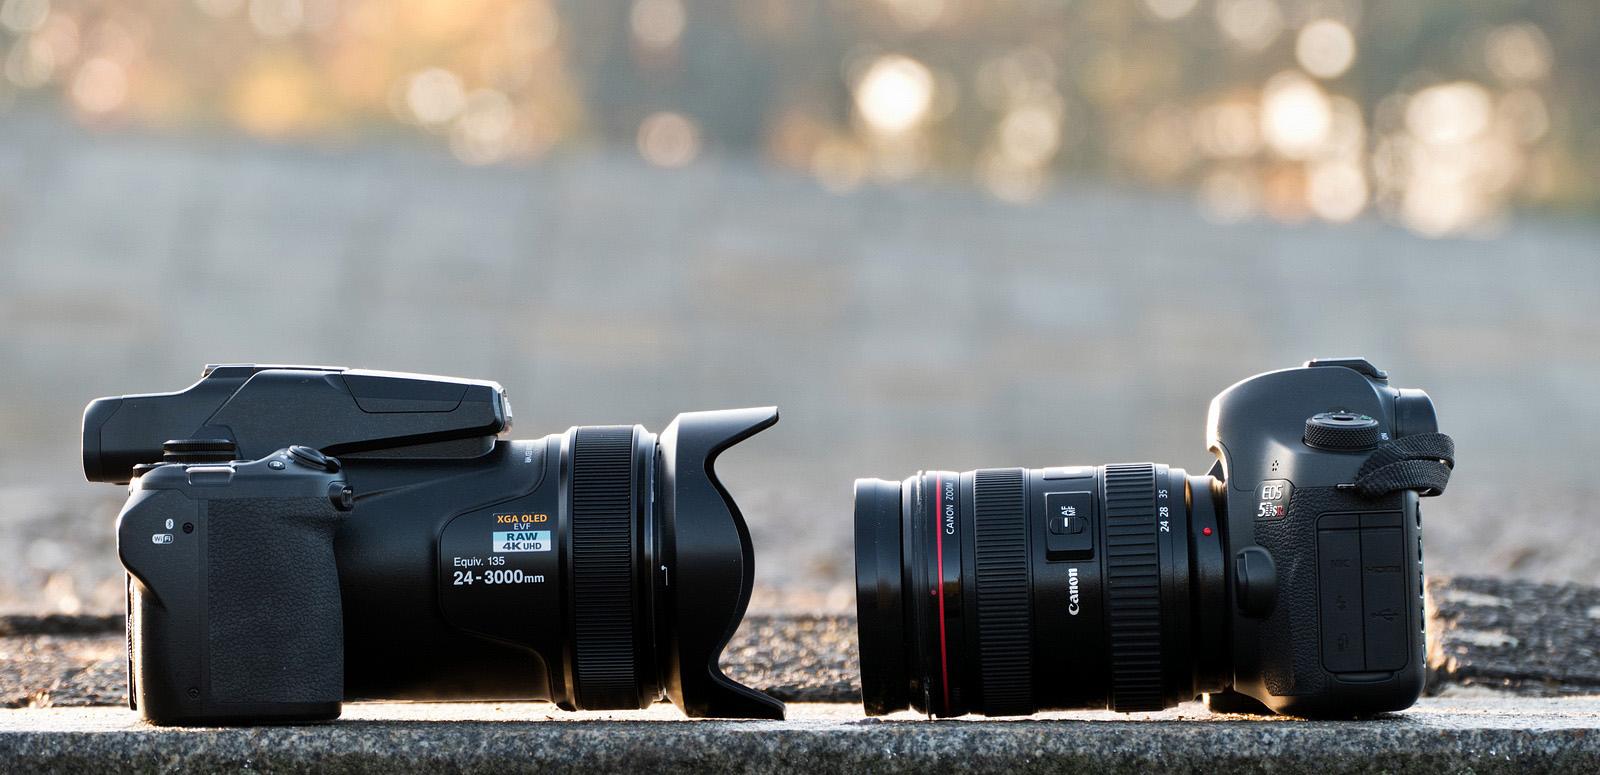 Ken Rockwell Nikon Coolpix P1000